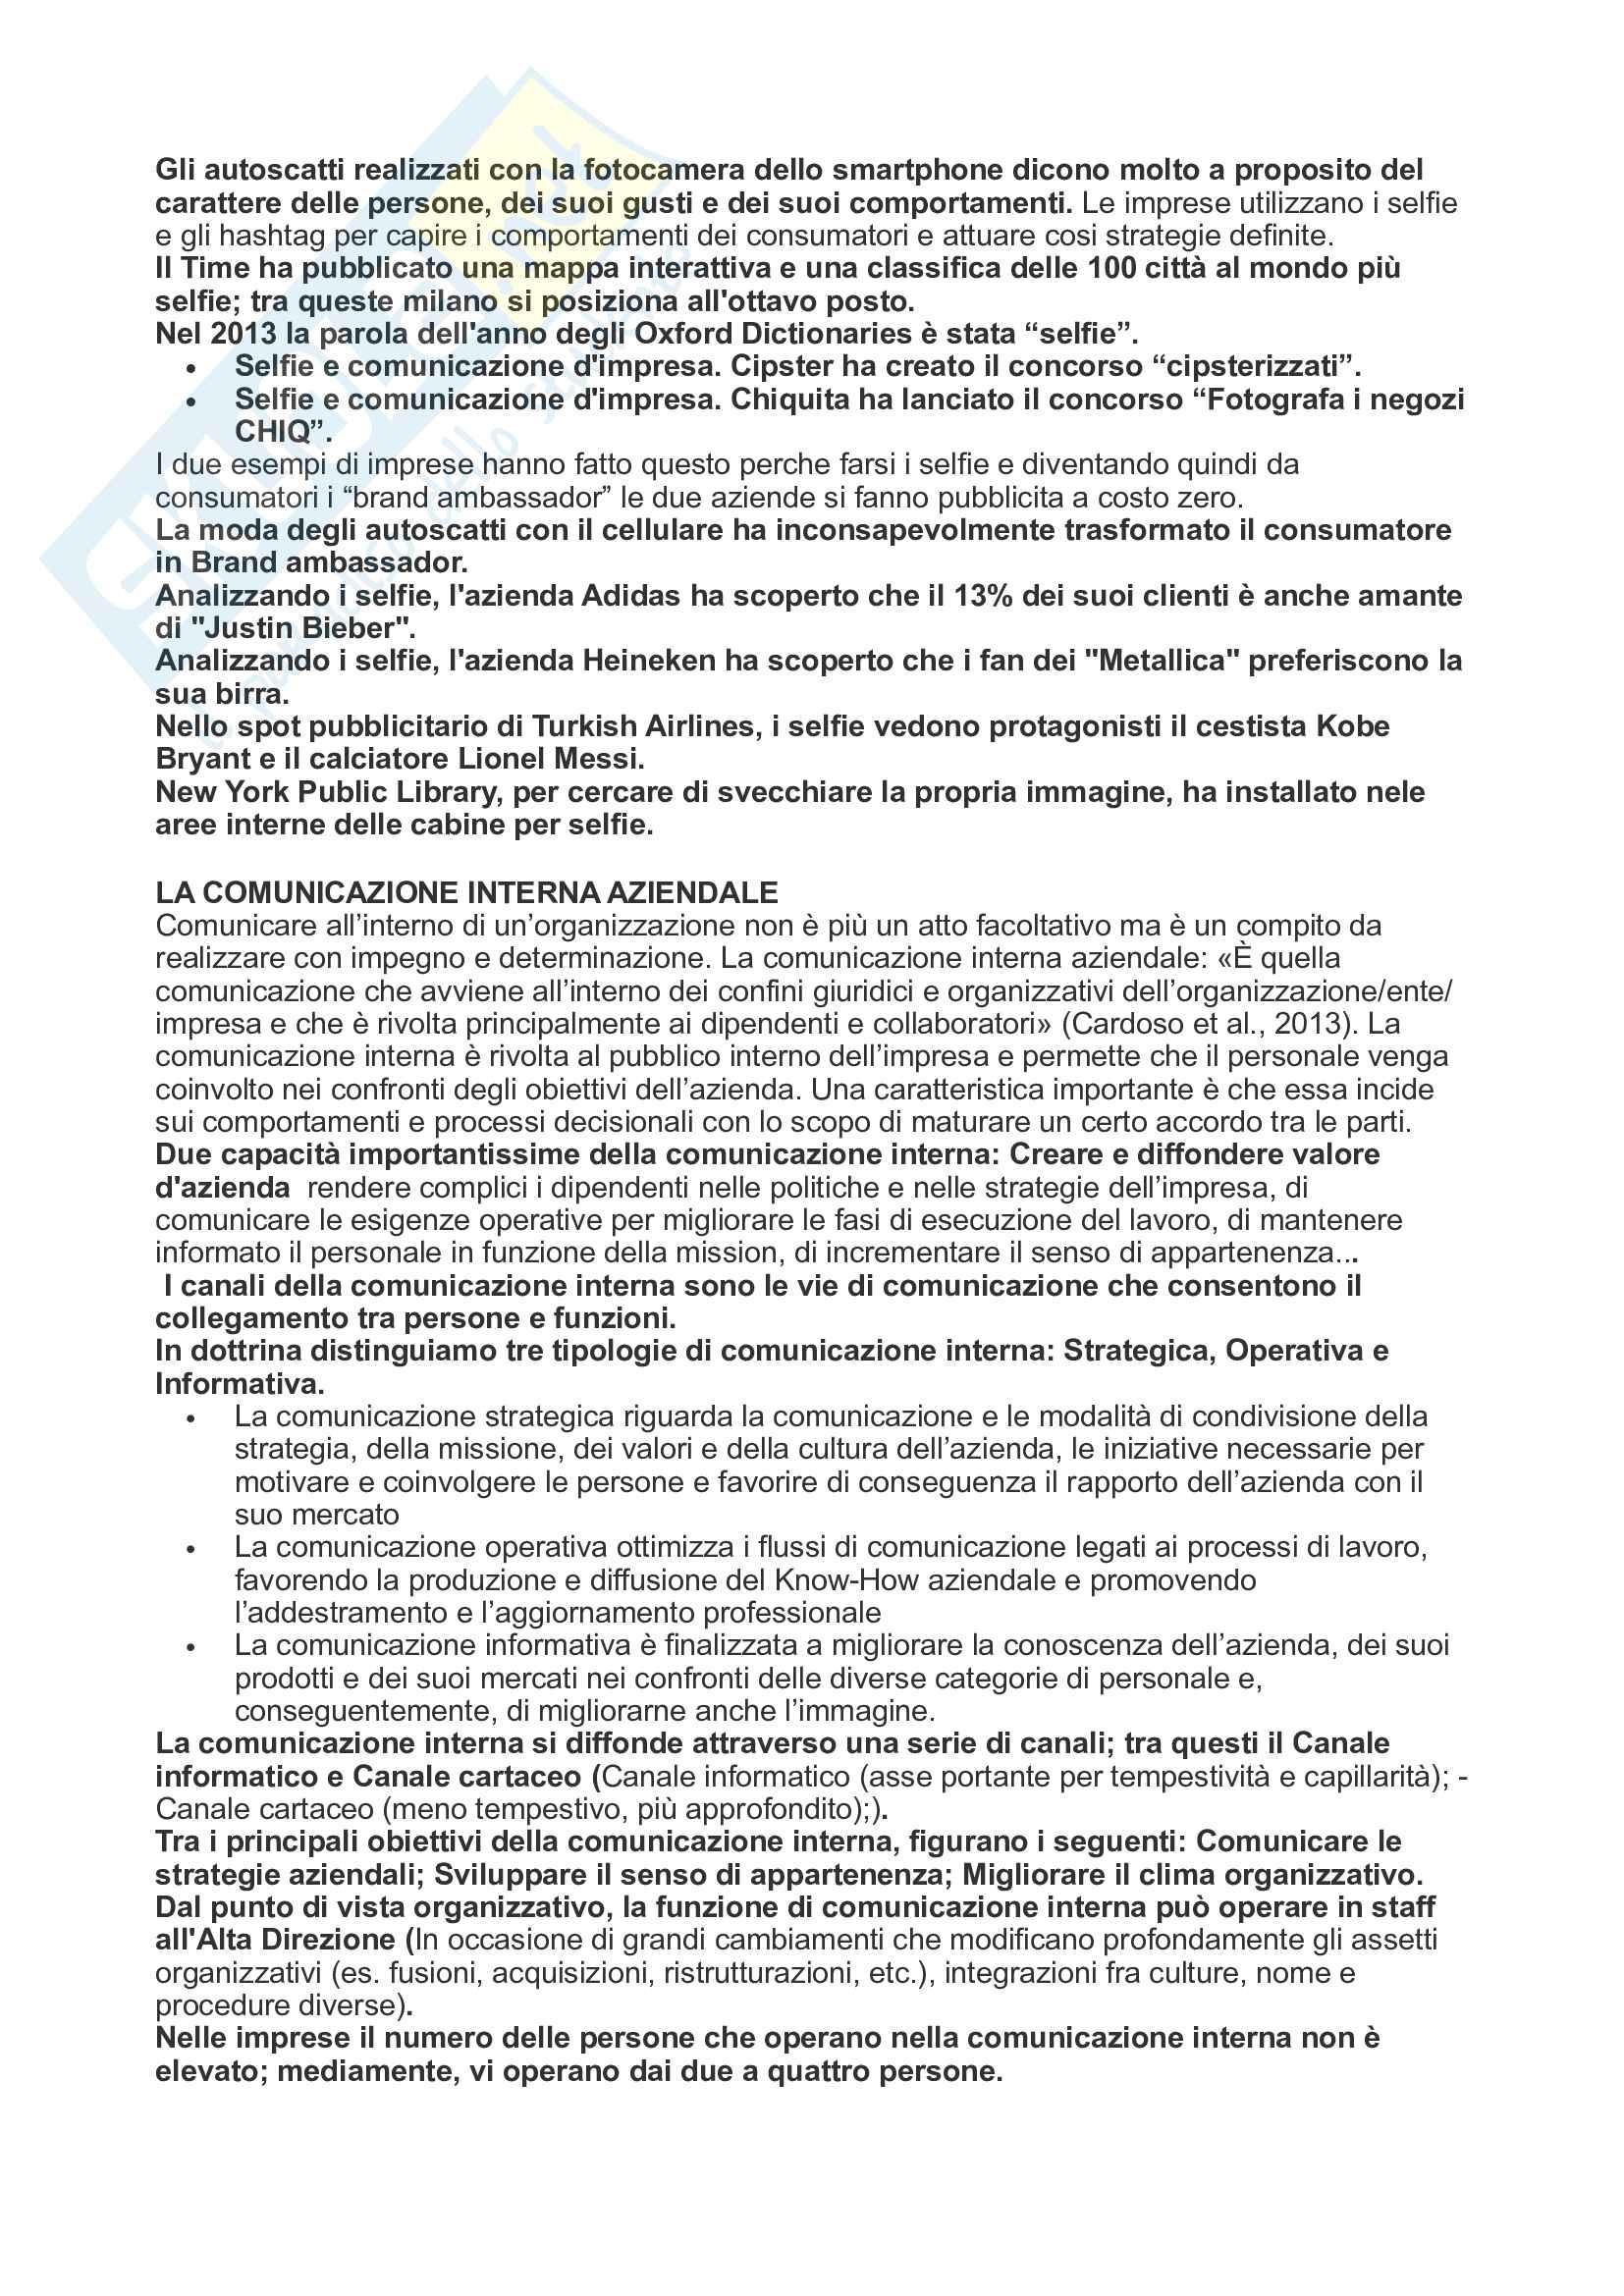 Riassunto Strategie di comunicazione d'impresa Pag. 31